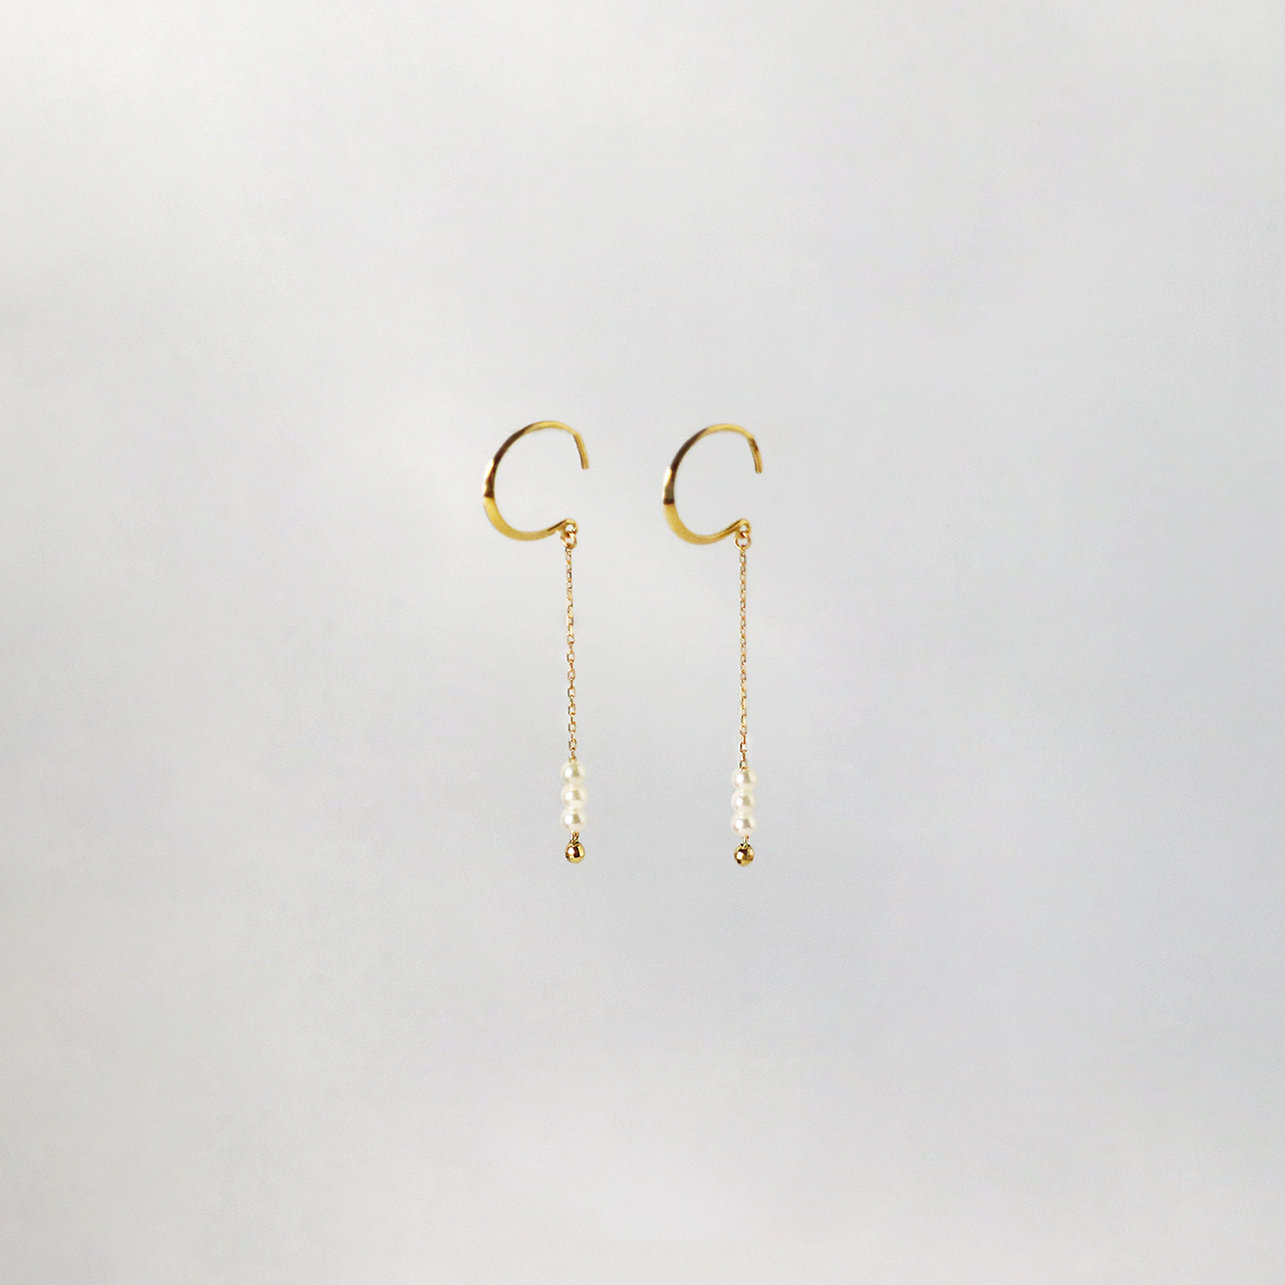 SUZURAN / Baby Pearl Hook Earrings (Short)